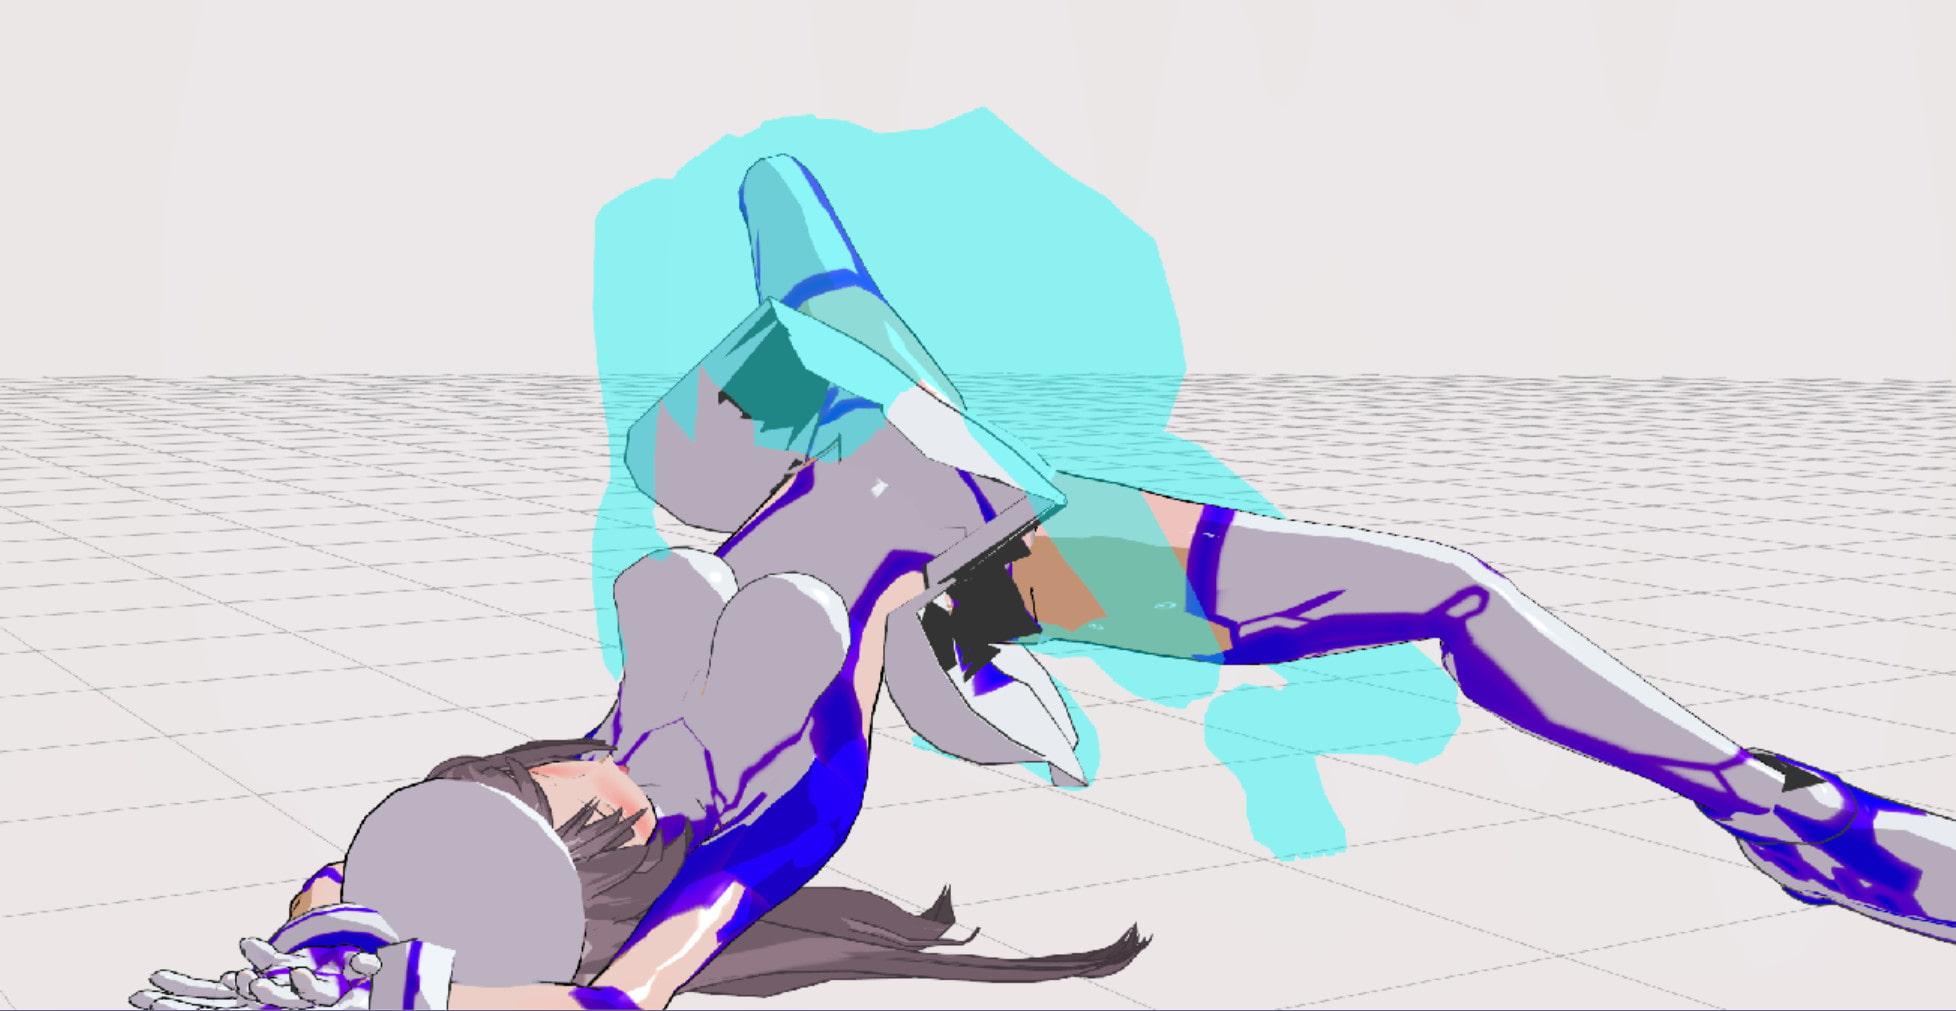 3Dカスタム少女追加モーション正常位smallpack4